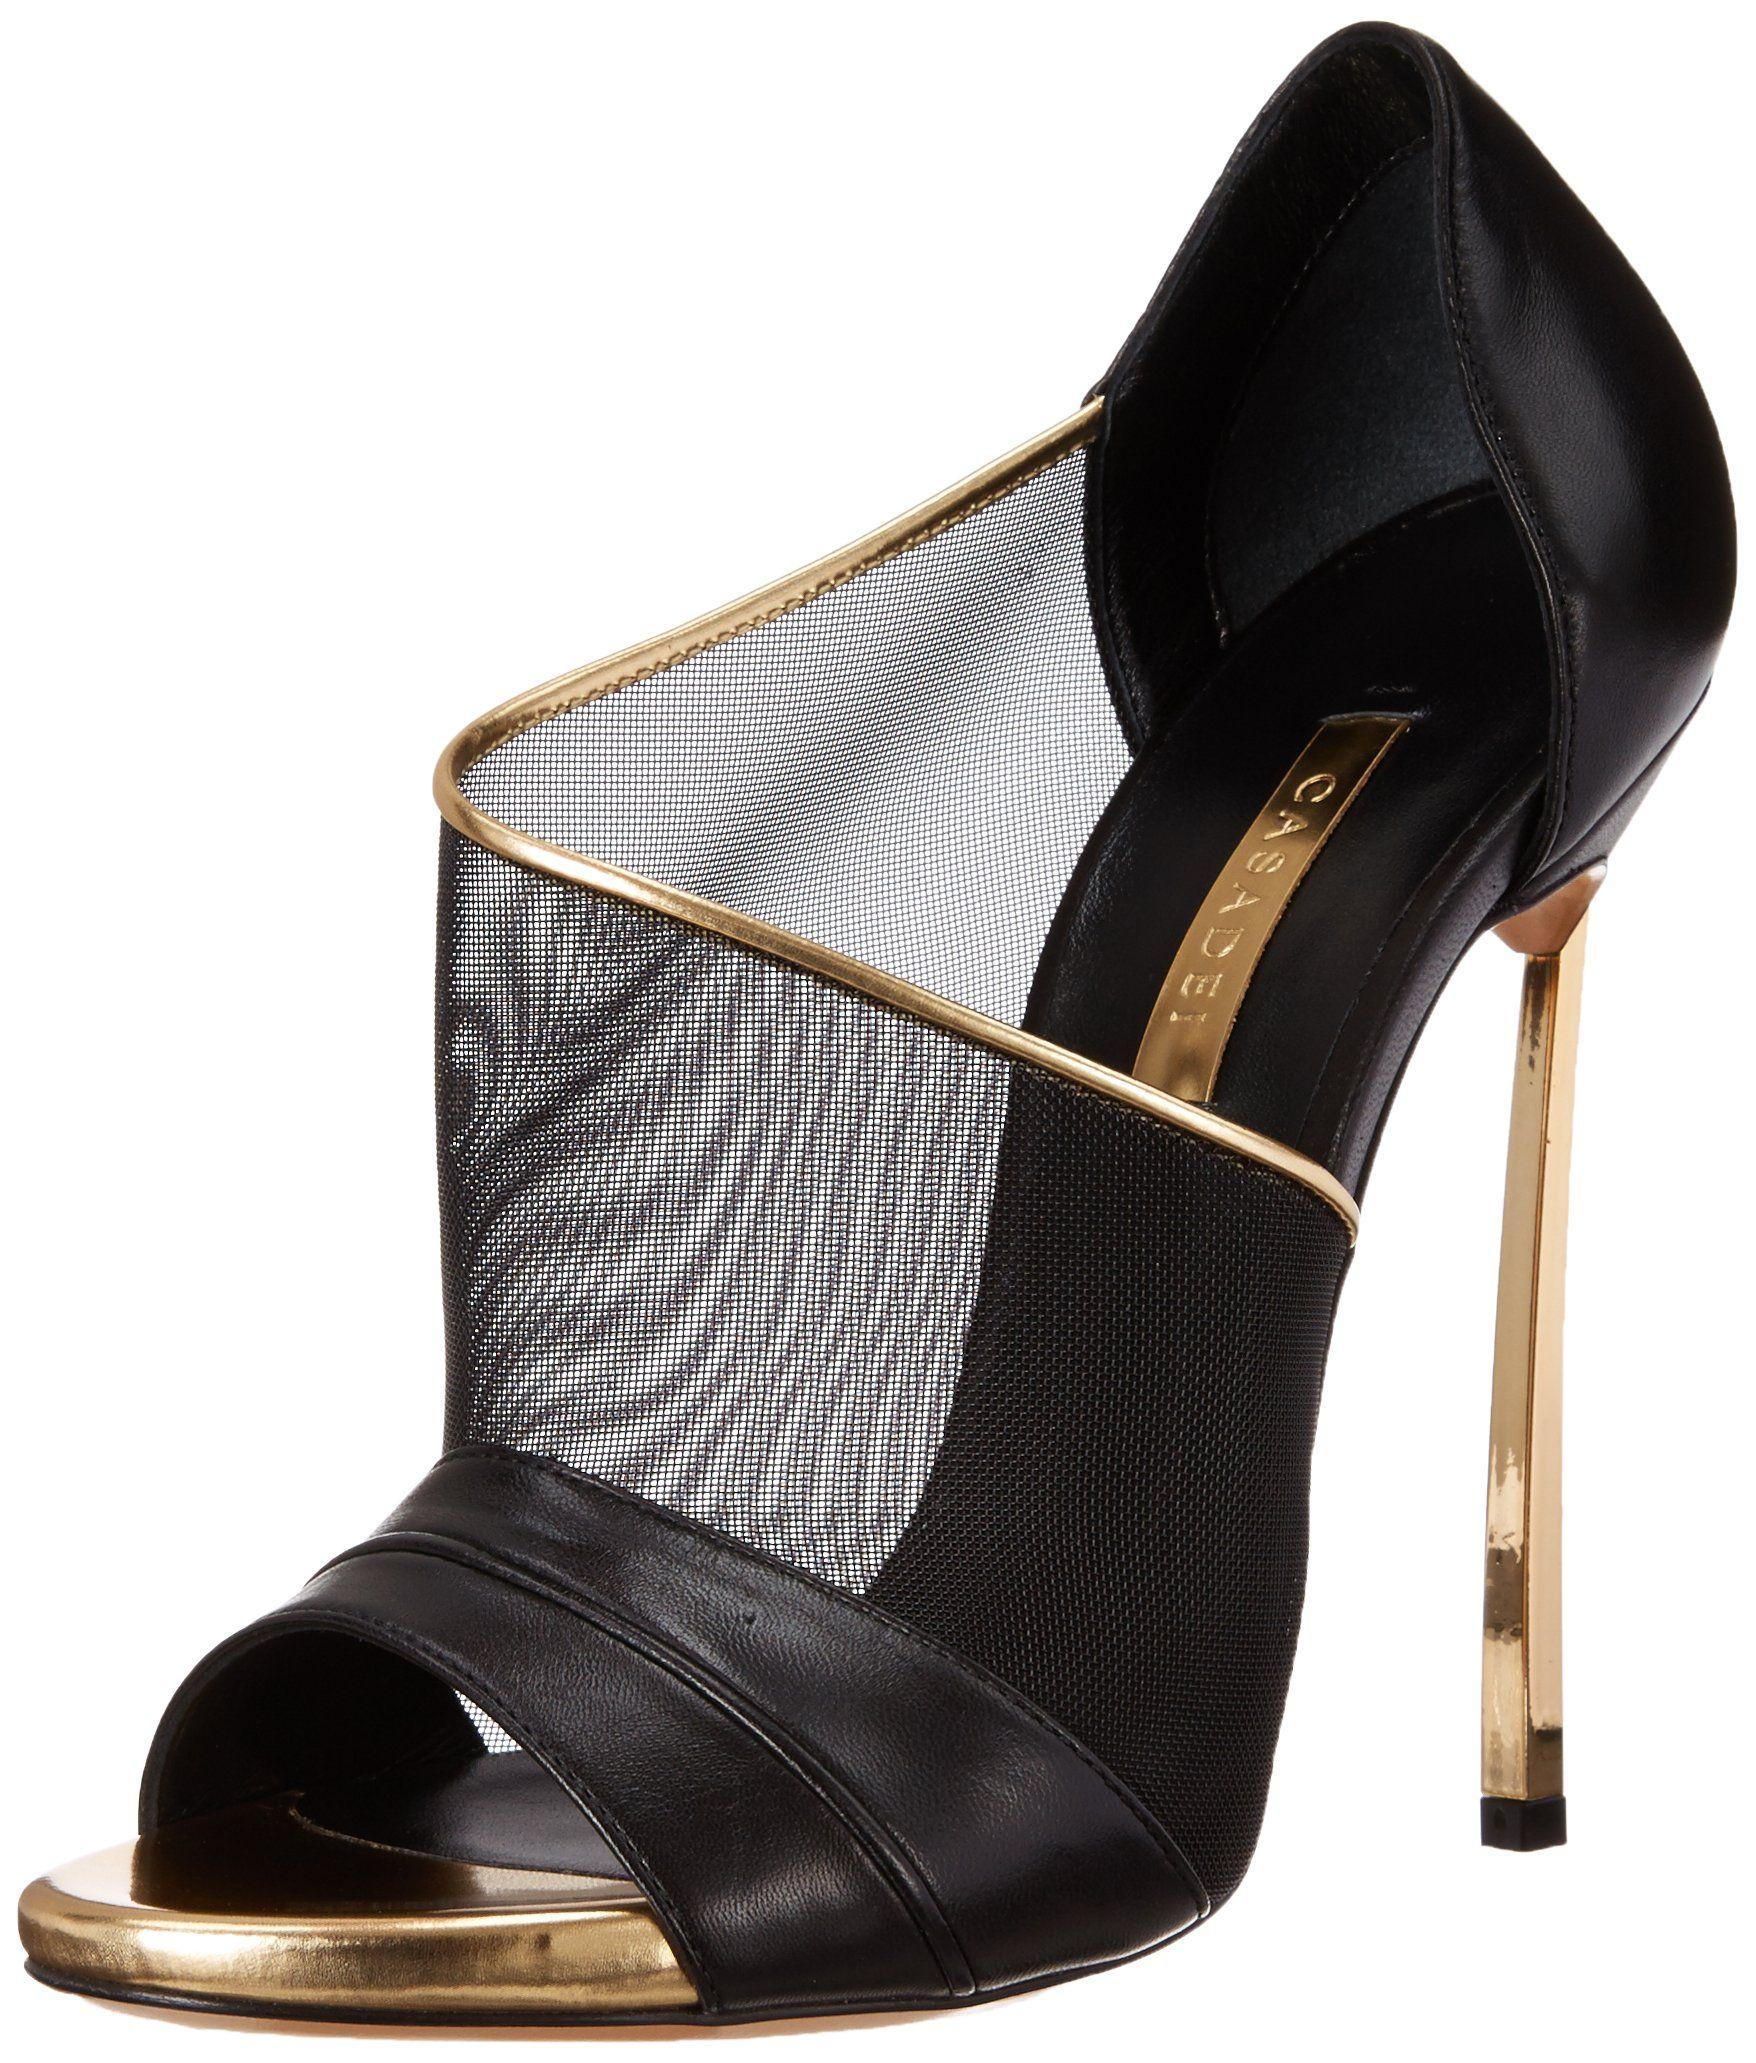 Casadei Women's Gold Heel Mesh Dress Sandal, NeroOro, 36 EU